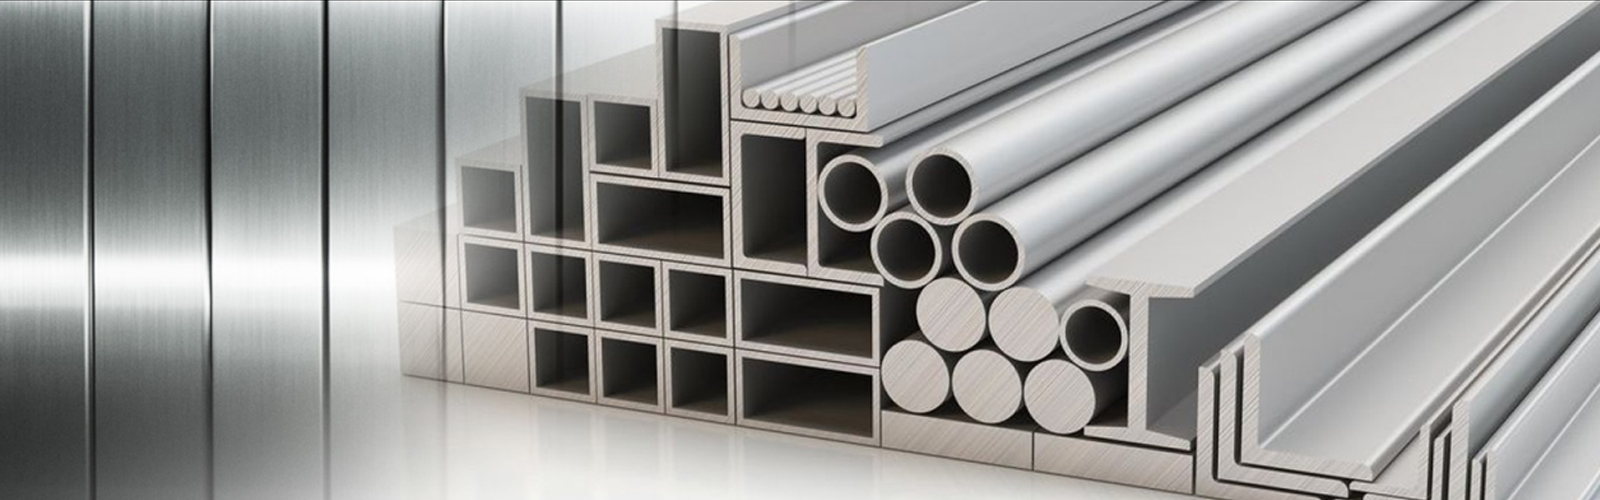 Kosan Aluminium Extrusion Malaysia